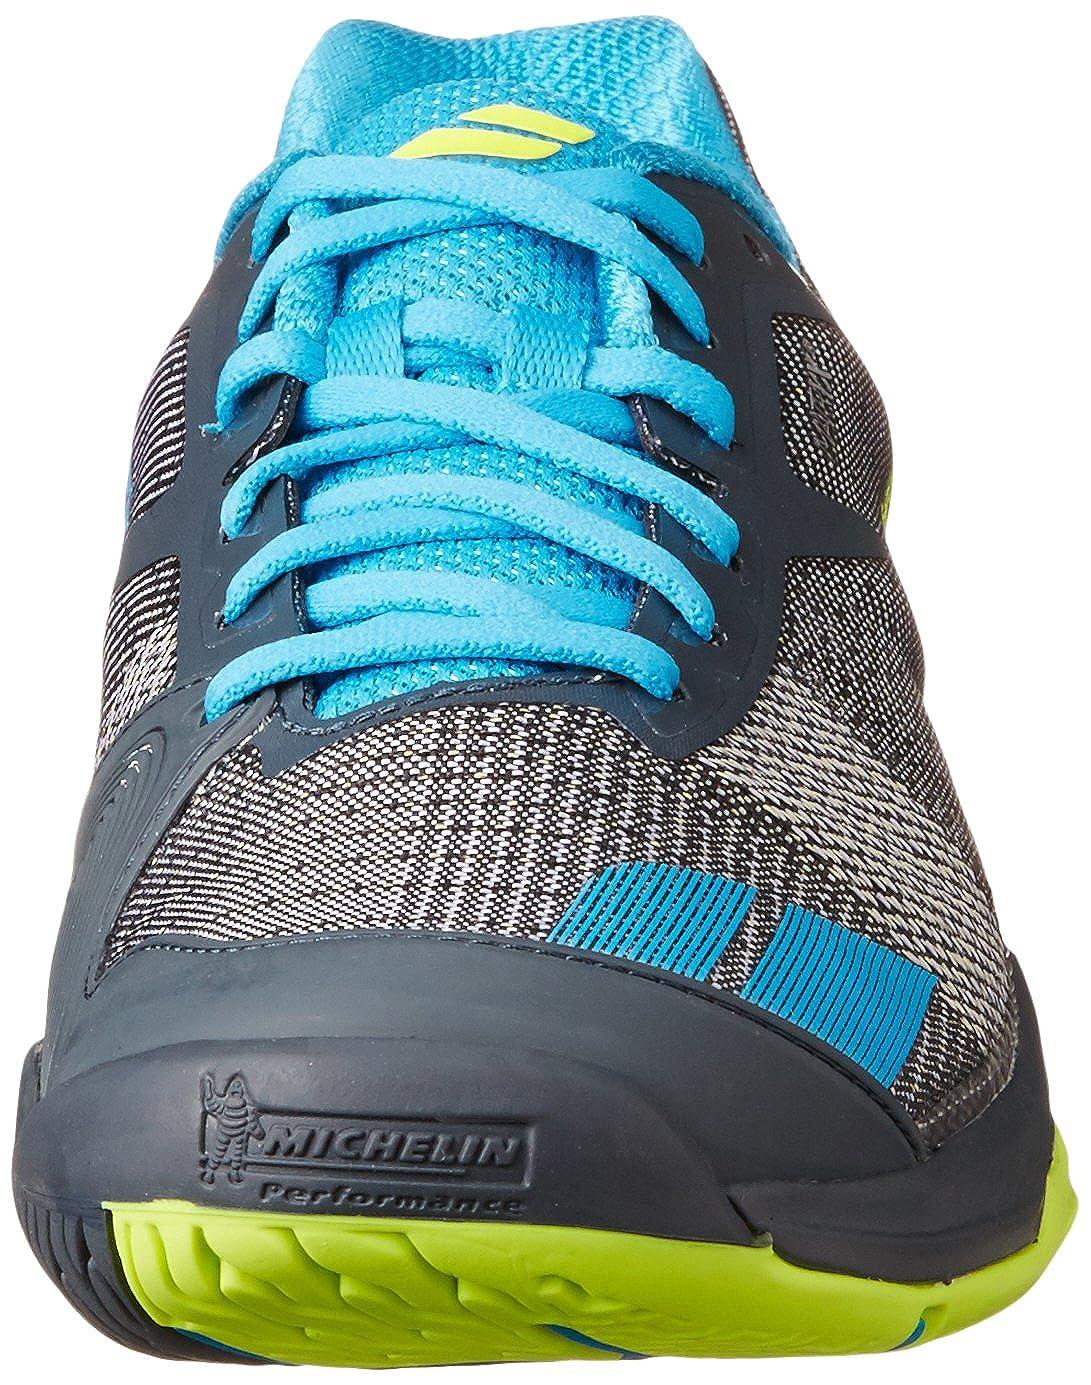 Amazon.com   Babolat Jet All Court Mens Tennis Sneakers/Shoes-Grey-11   Tennis & Racquet Sports